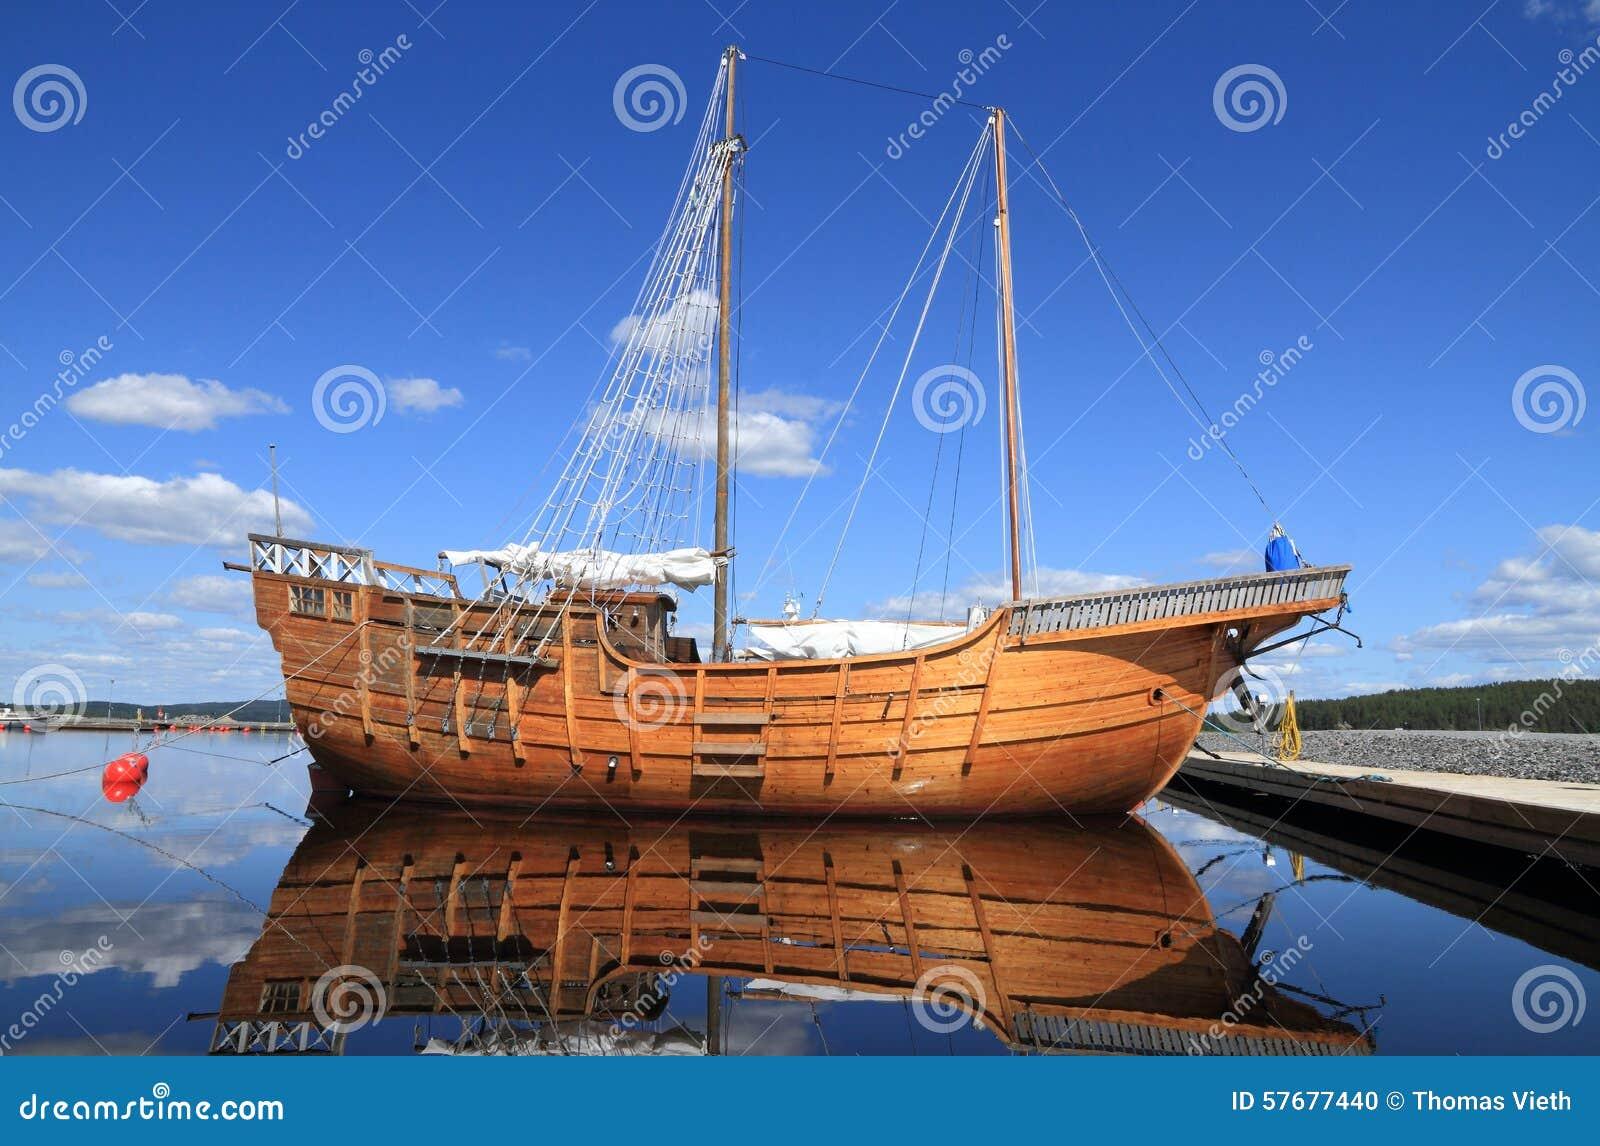 Finland/Tourism: Pirate Ship? Stock Photo - Image: 57677440